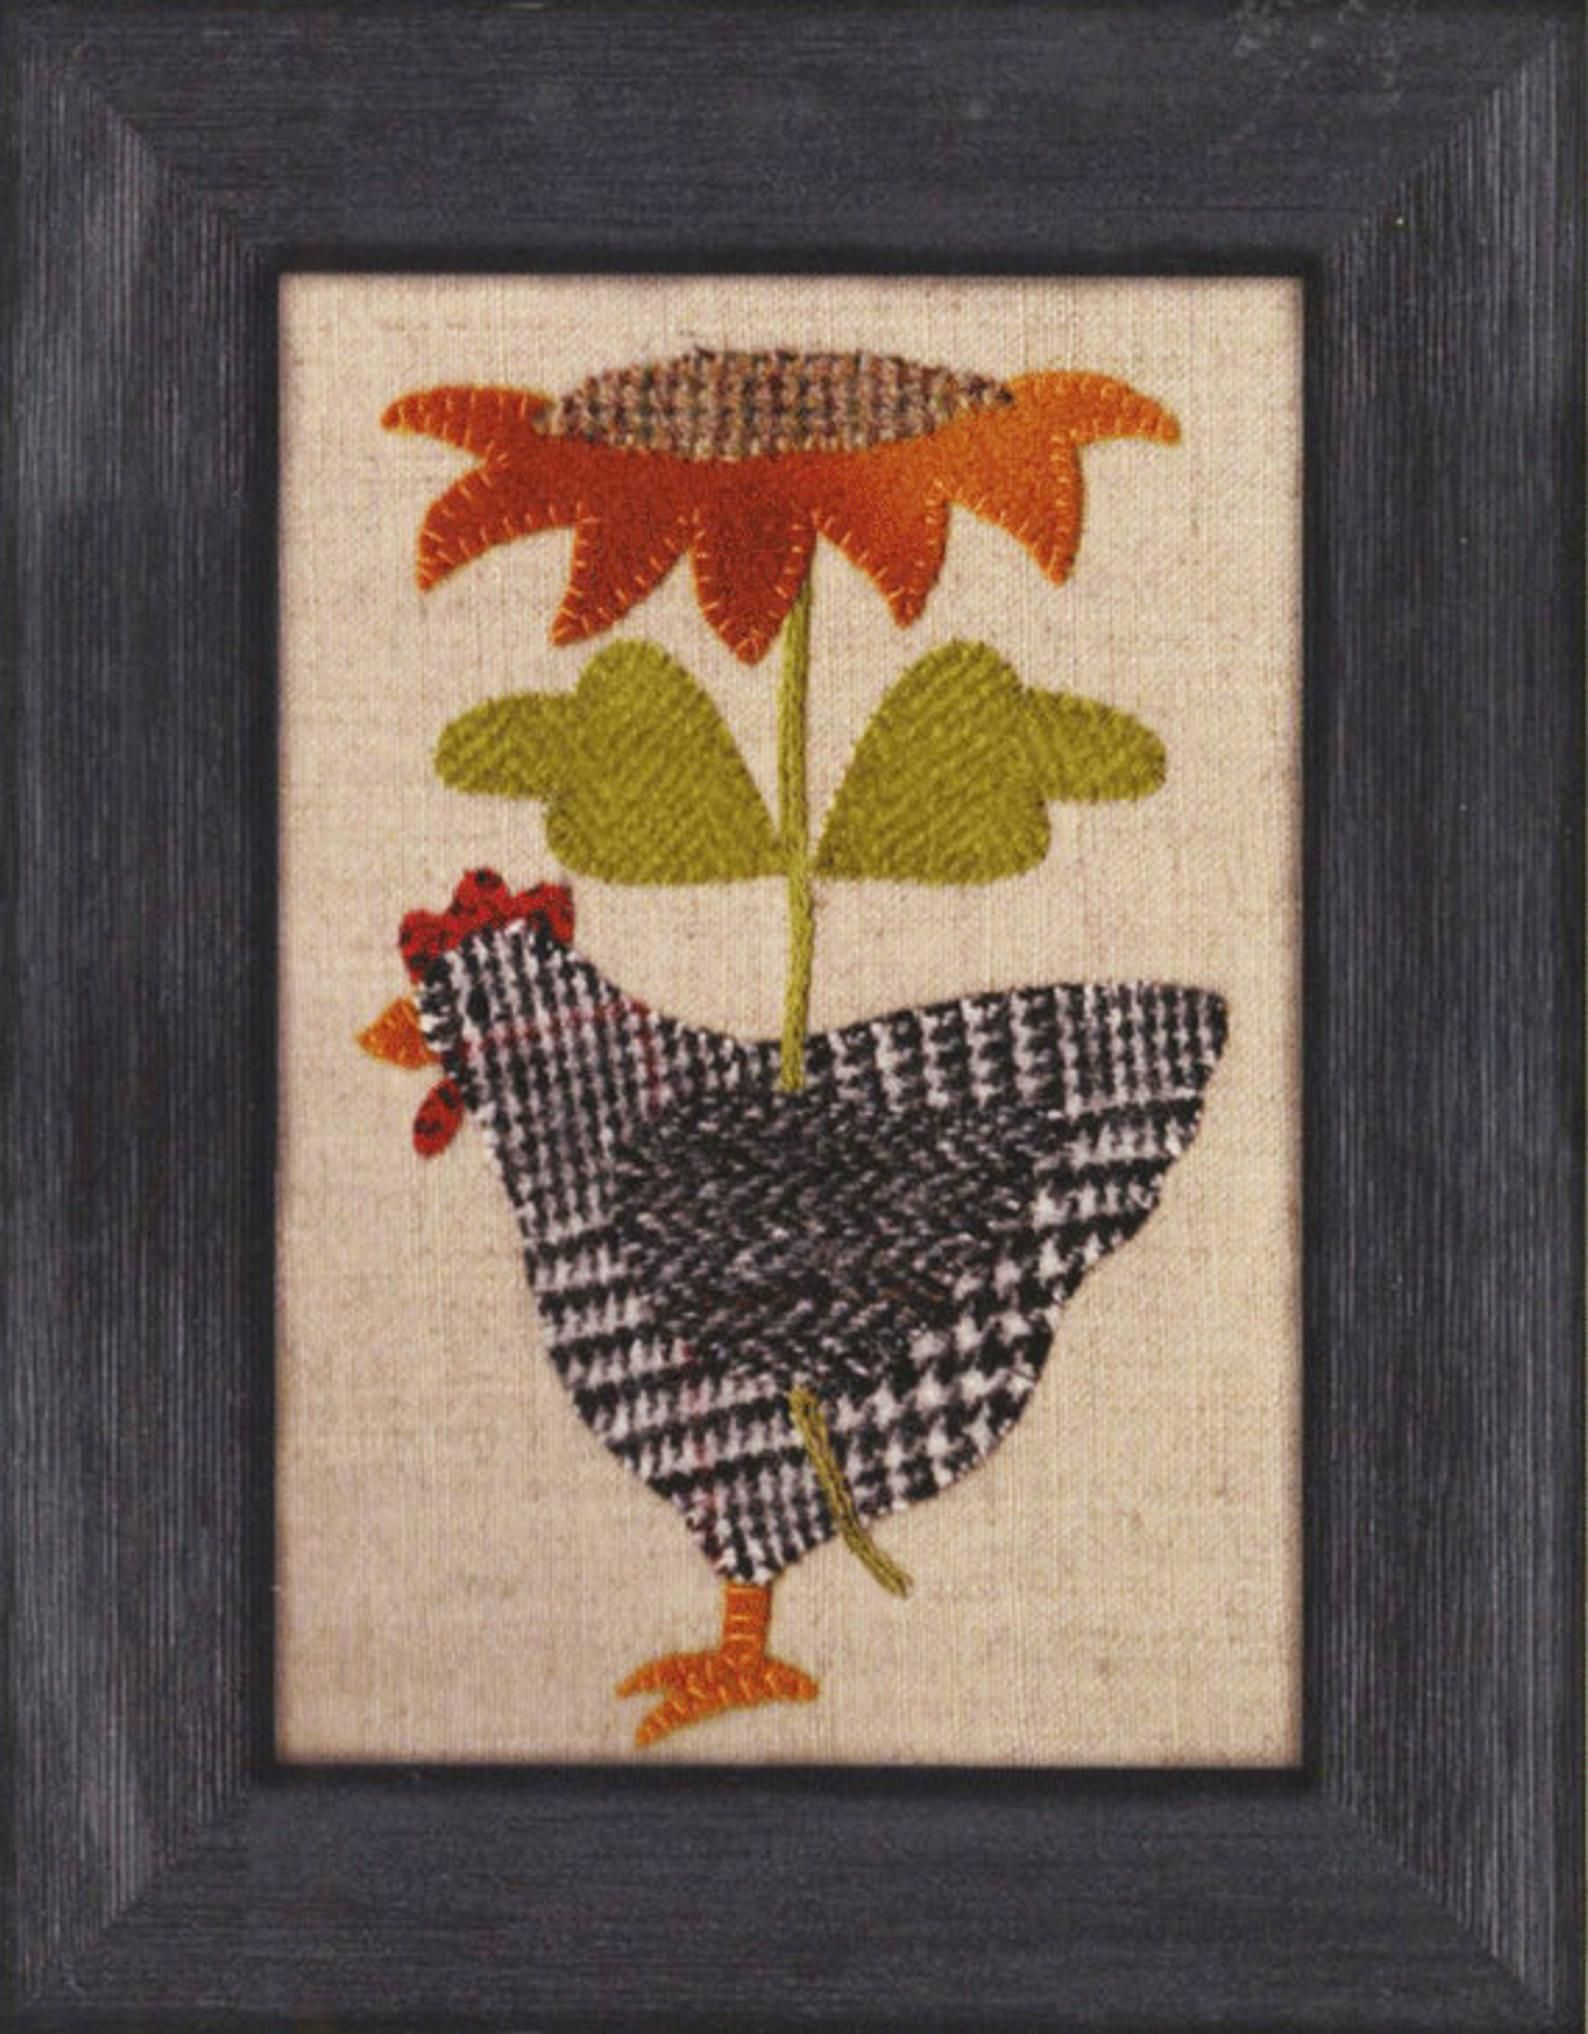 Henny Penny Pattern Atn Hen Chicken With Sunflower